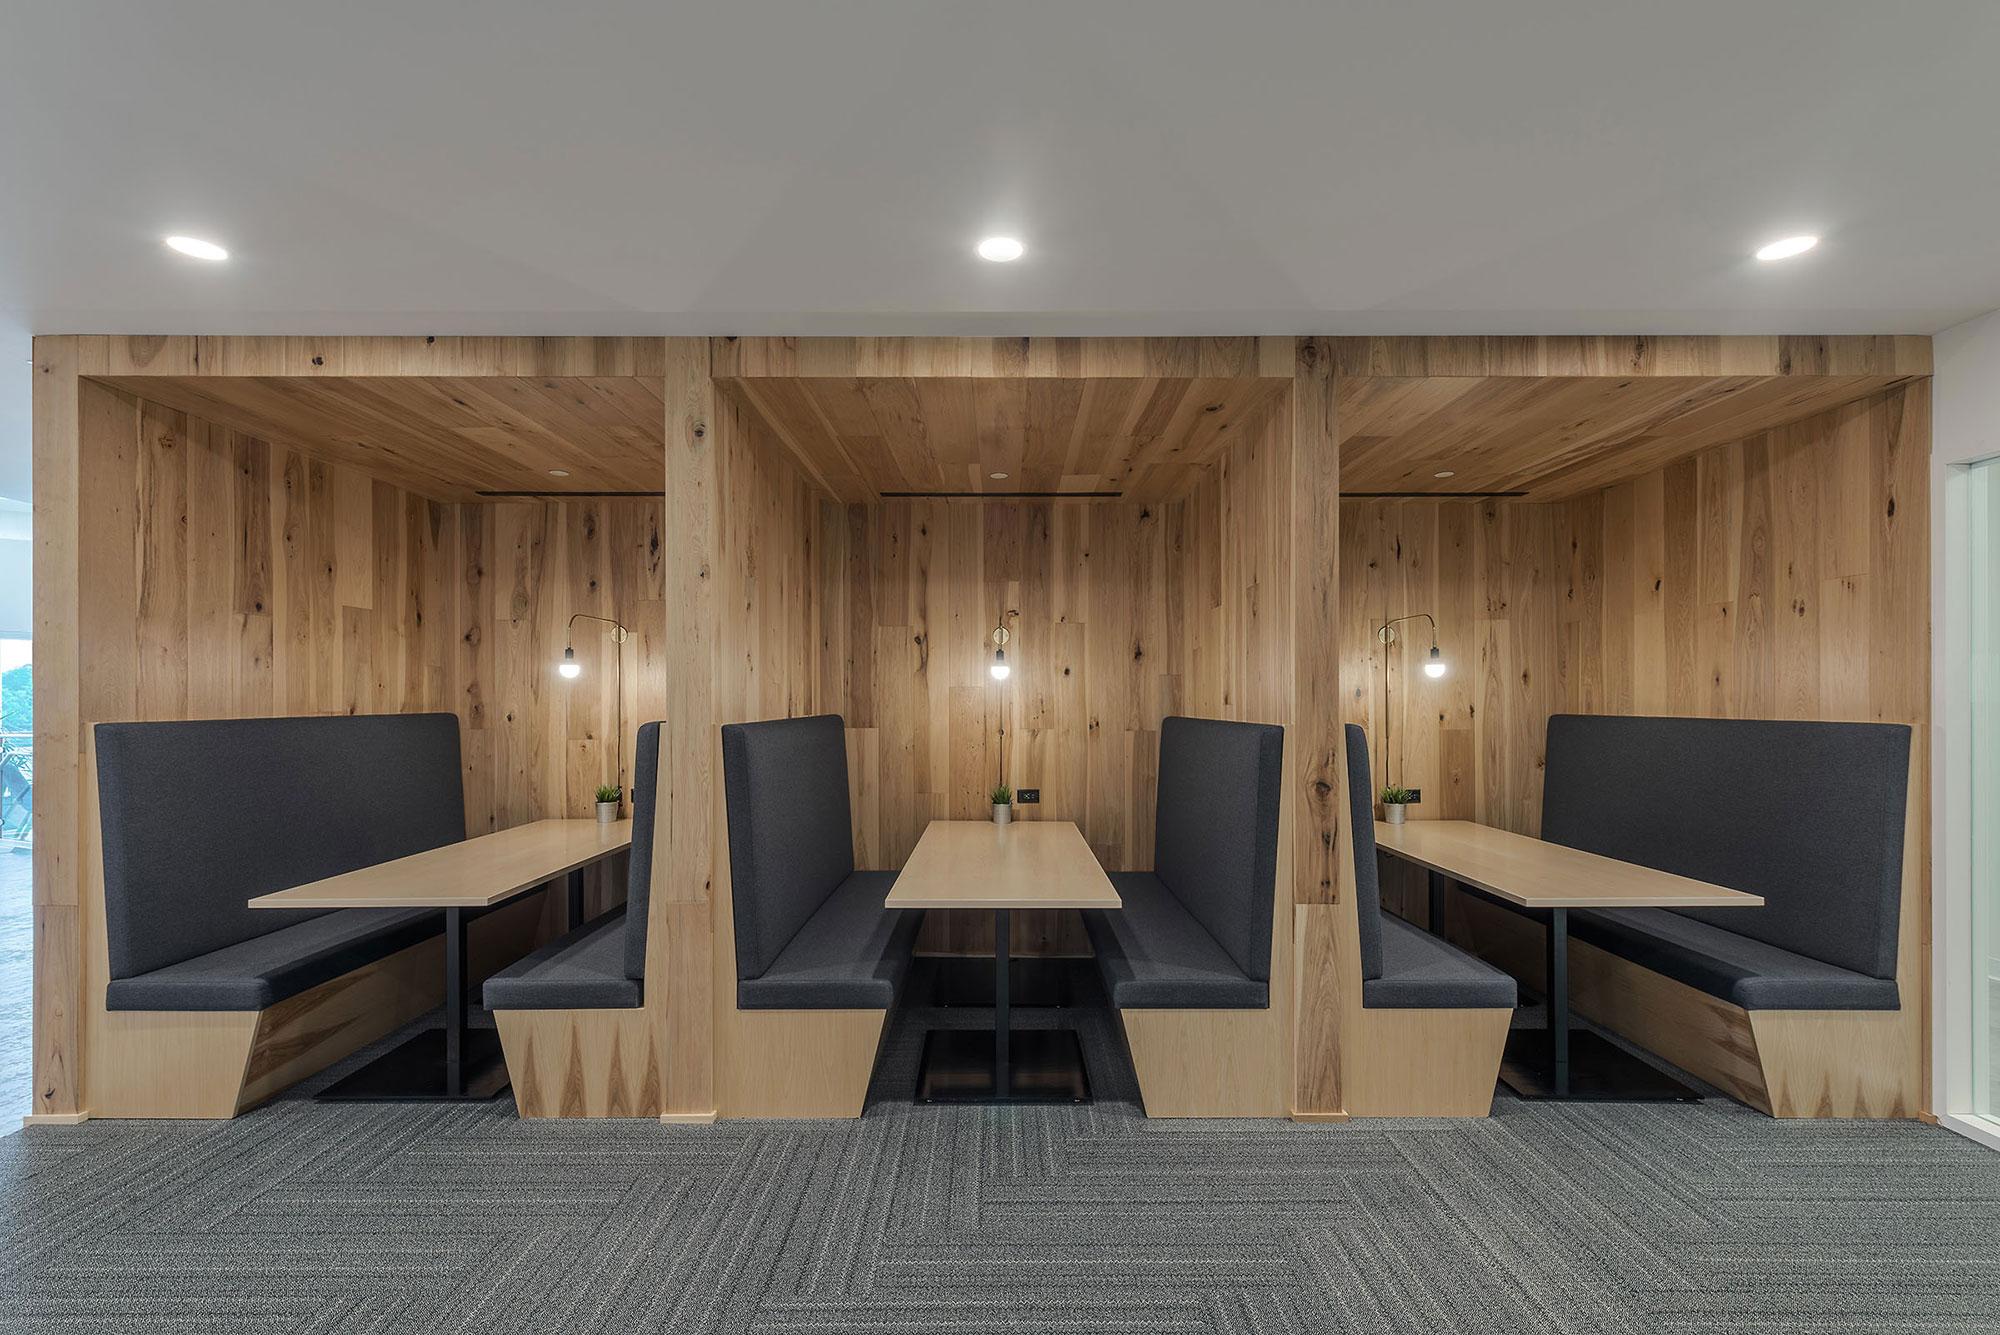 halifax-interior-design-financial-office-bench-seating.jpg